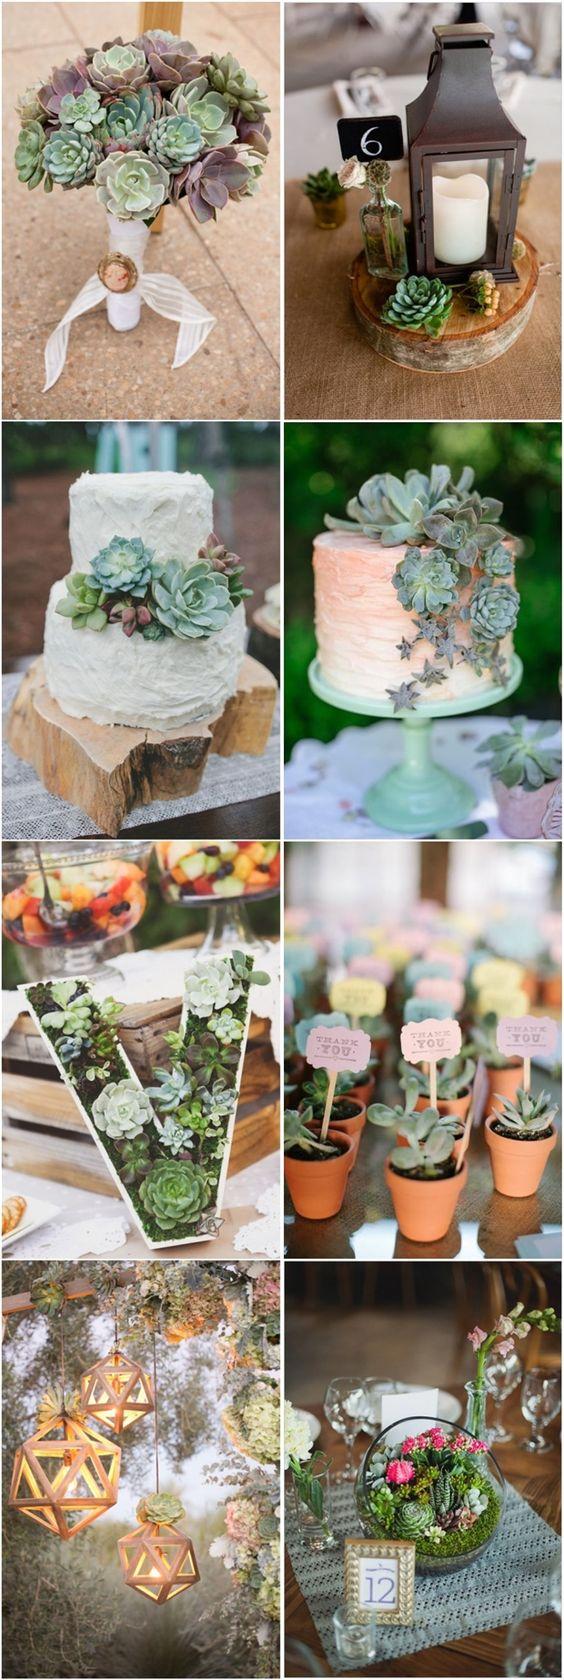 succulent rustic wedding ideas- green country wedding ideas